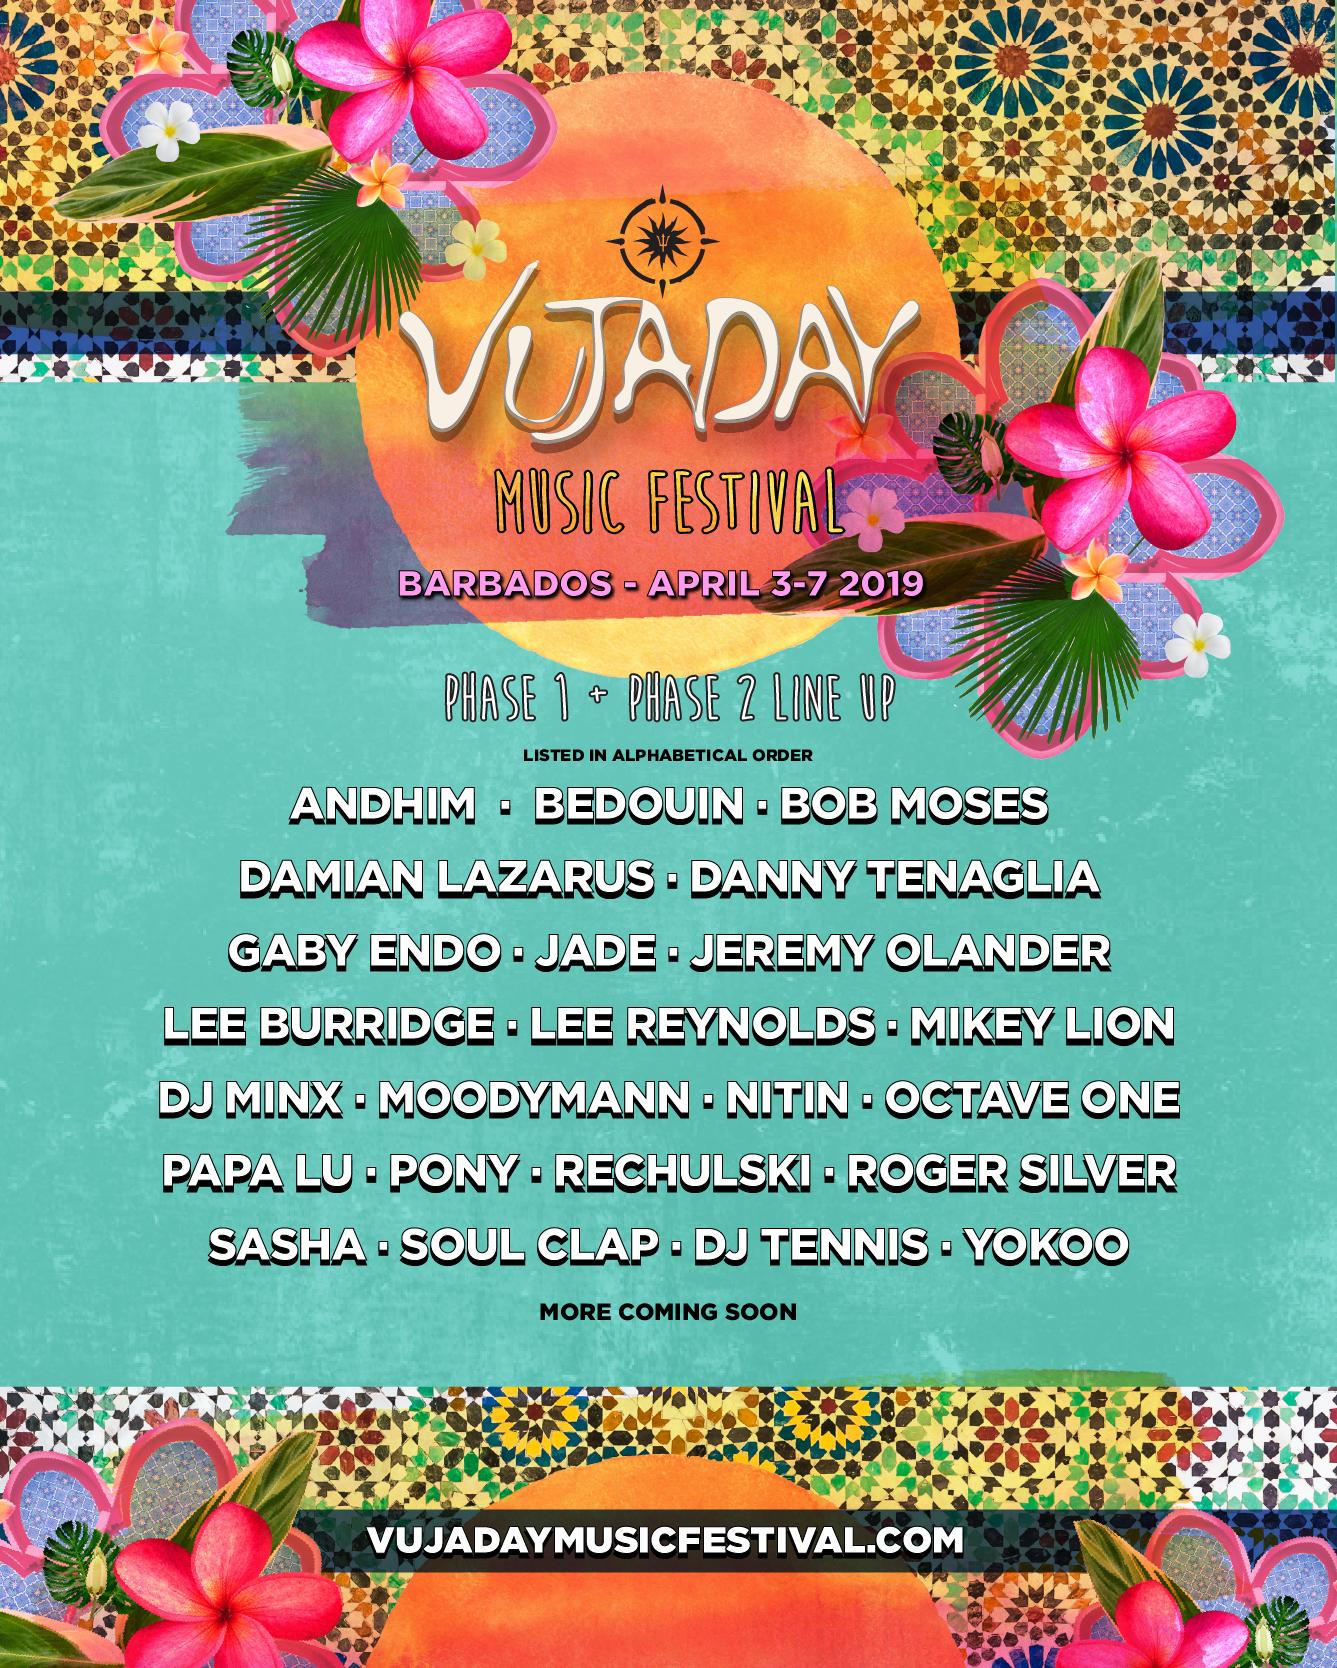 Vujaday festival locks Danny Tenaglia, Moodymann, Sasha, more for